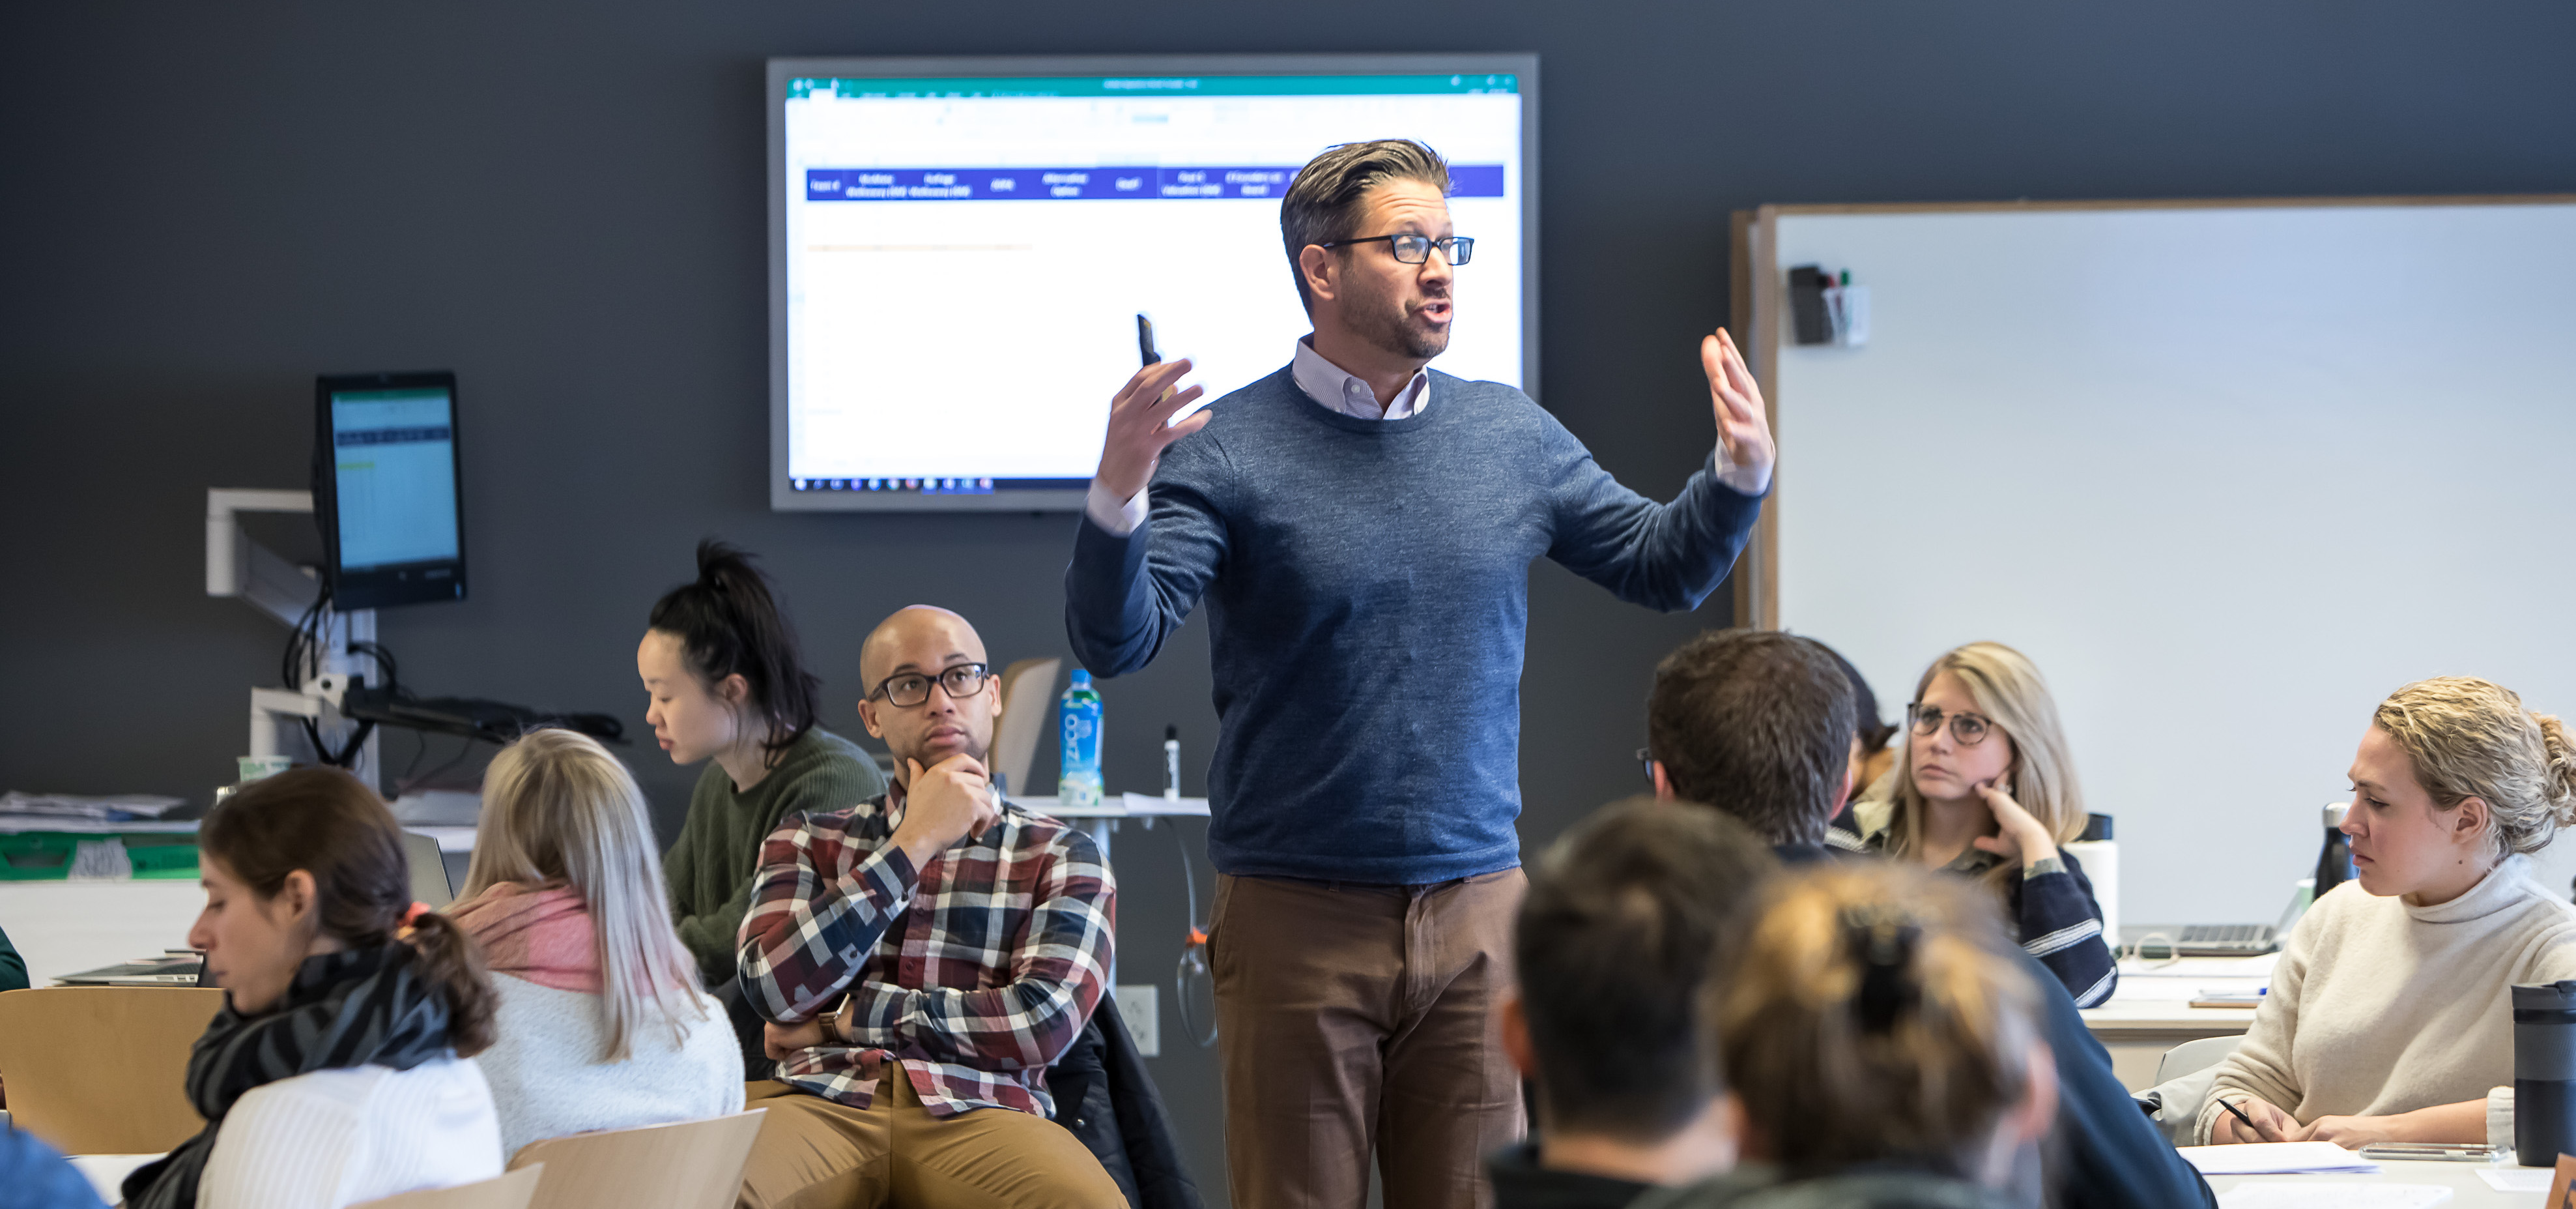 MBA Curriculum Spotlight: Short Intensive Programs (SIPs)